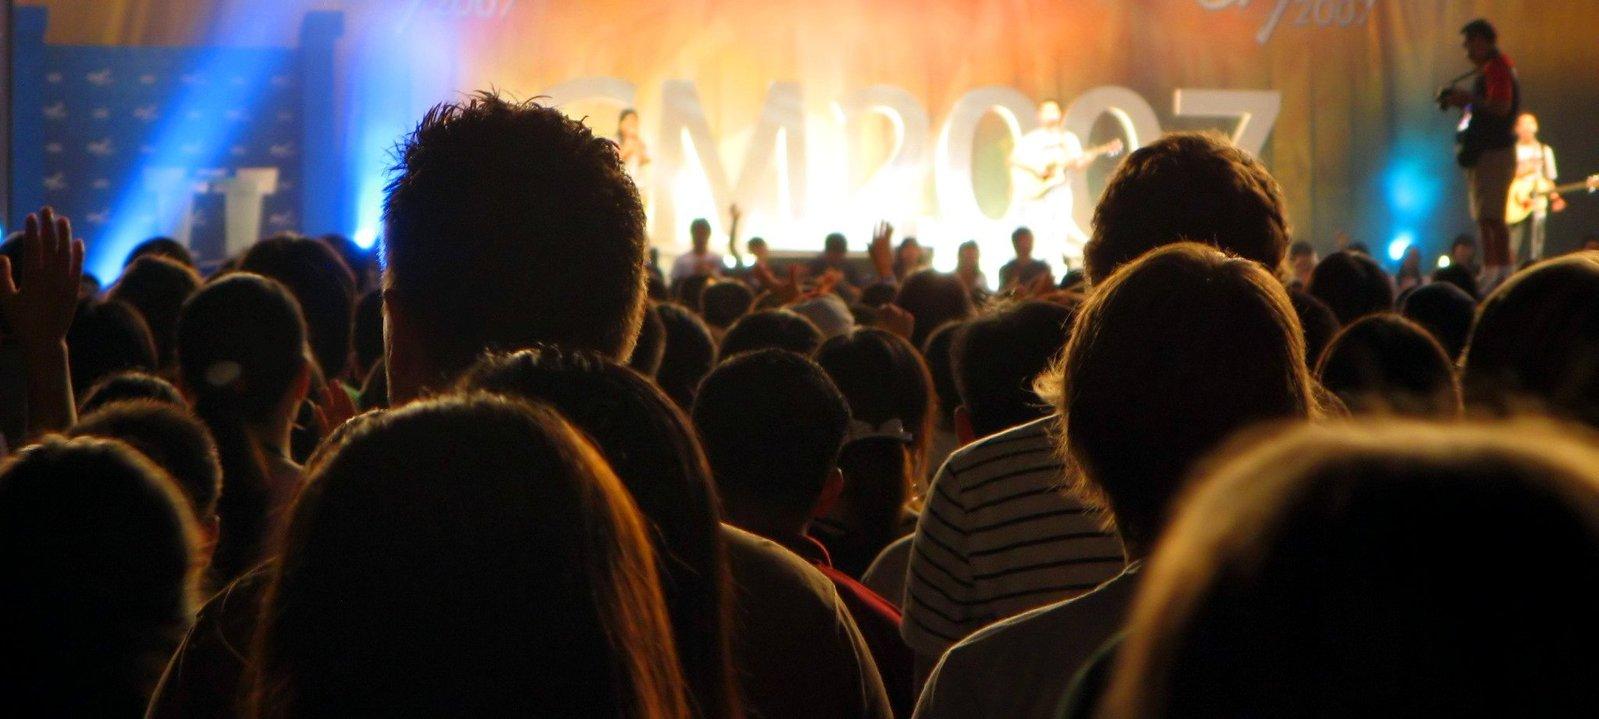 Christian Music: an updated opinion piece